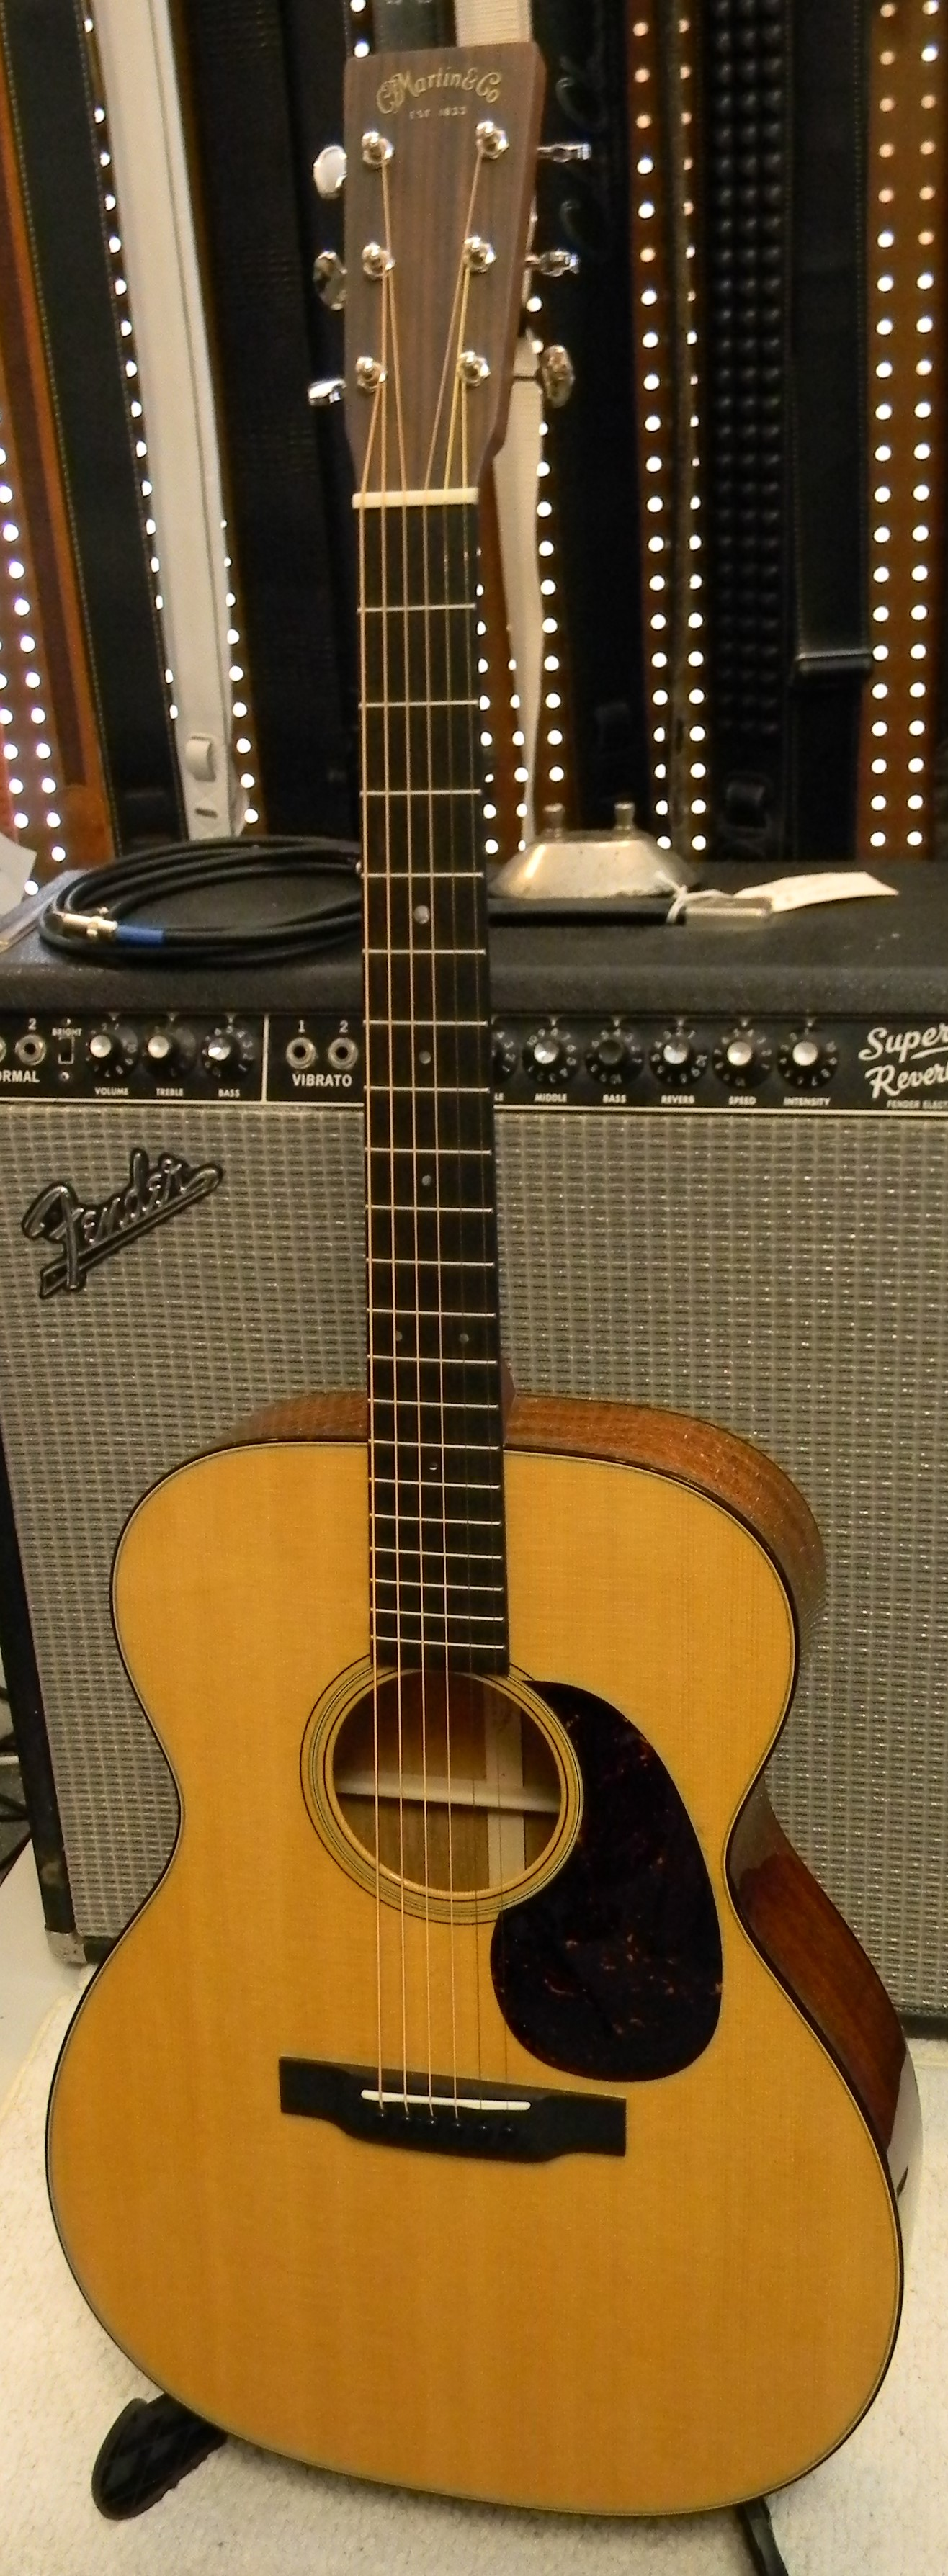 dscn0323 san antonio guitar store guitar tex. Black Bedroom Furniture Sets. Home Design Ideas